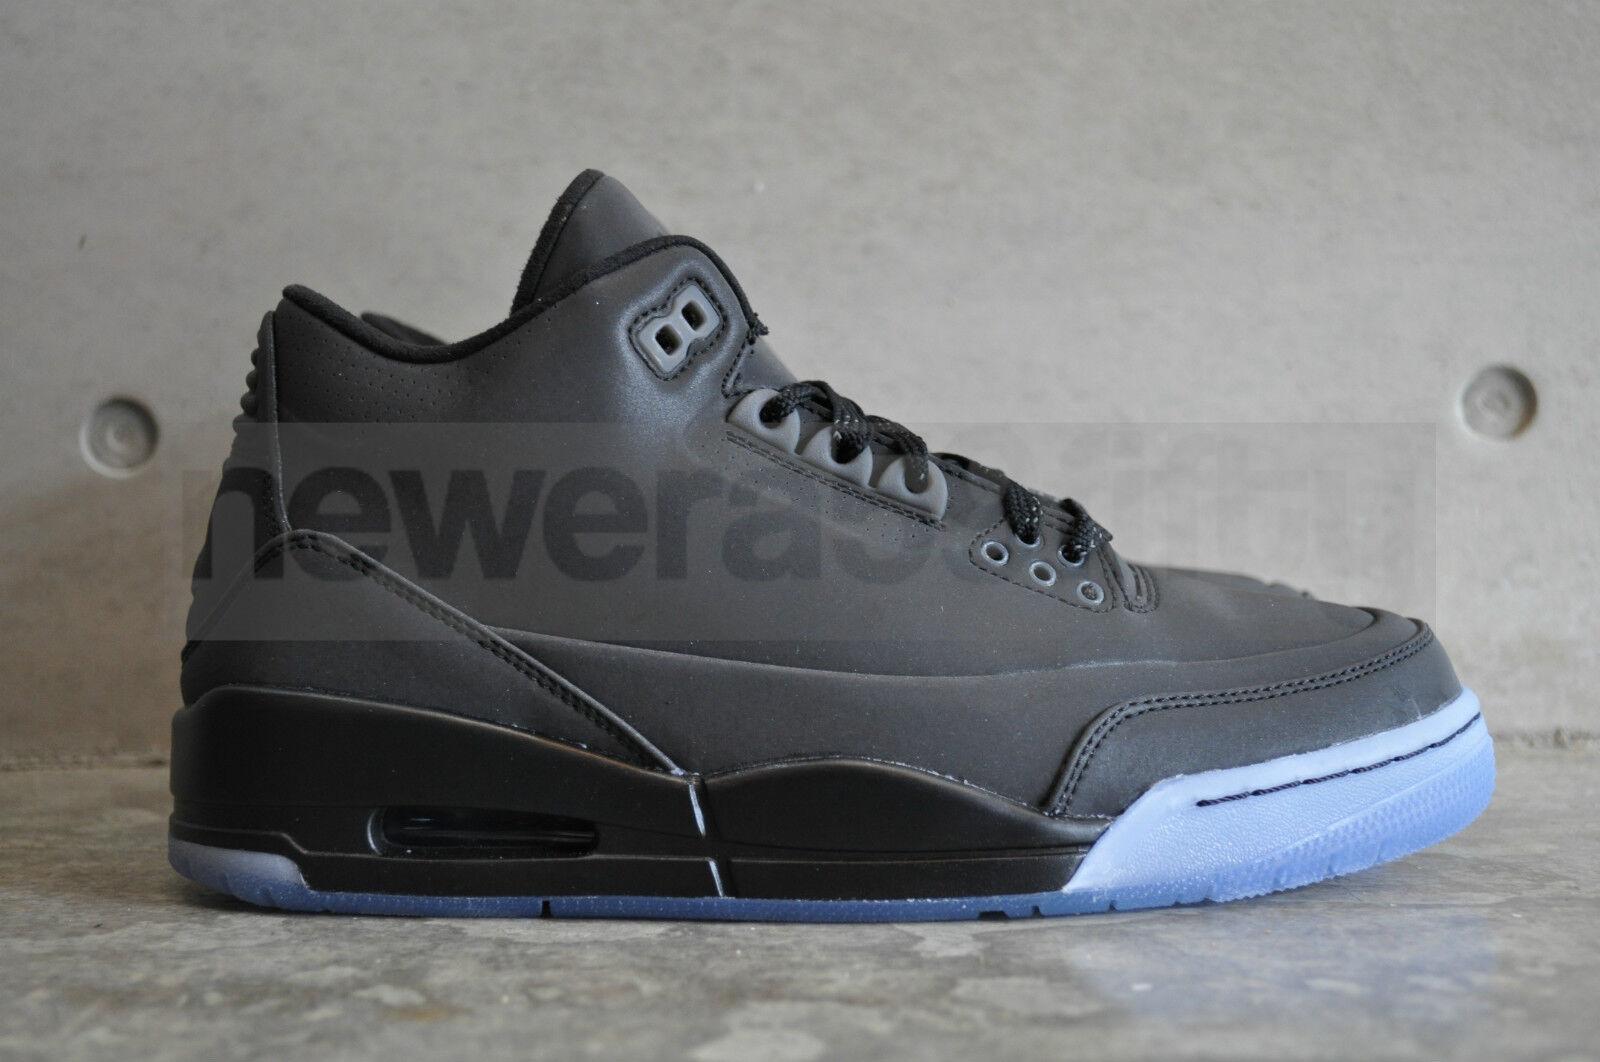 buy online b5a00 7fb36 Details about Nike Air Jordan 5Lab3 Black Reflective - Black/Black-Clear